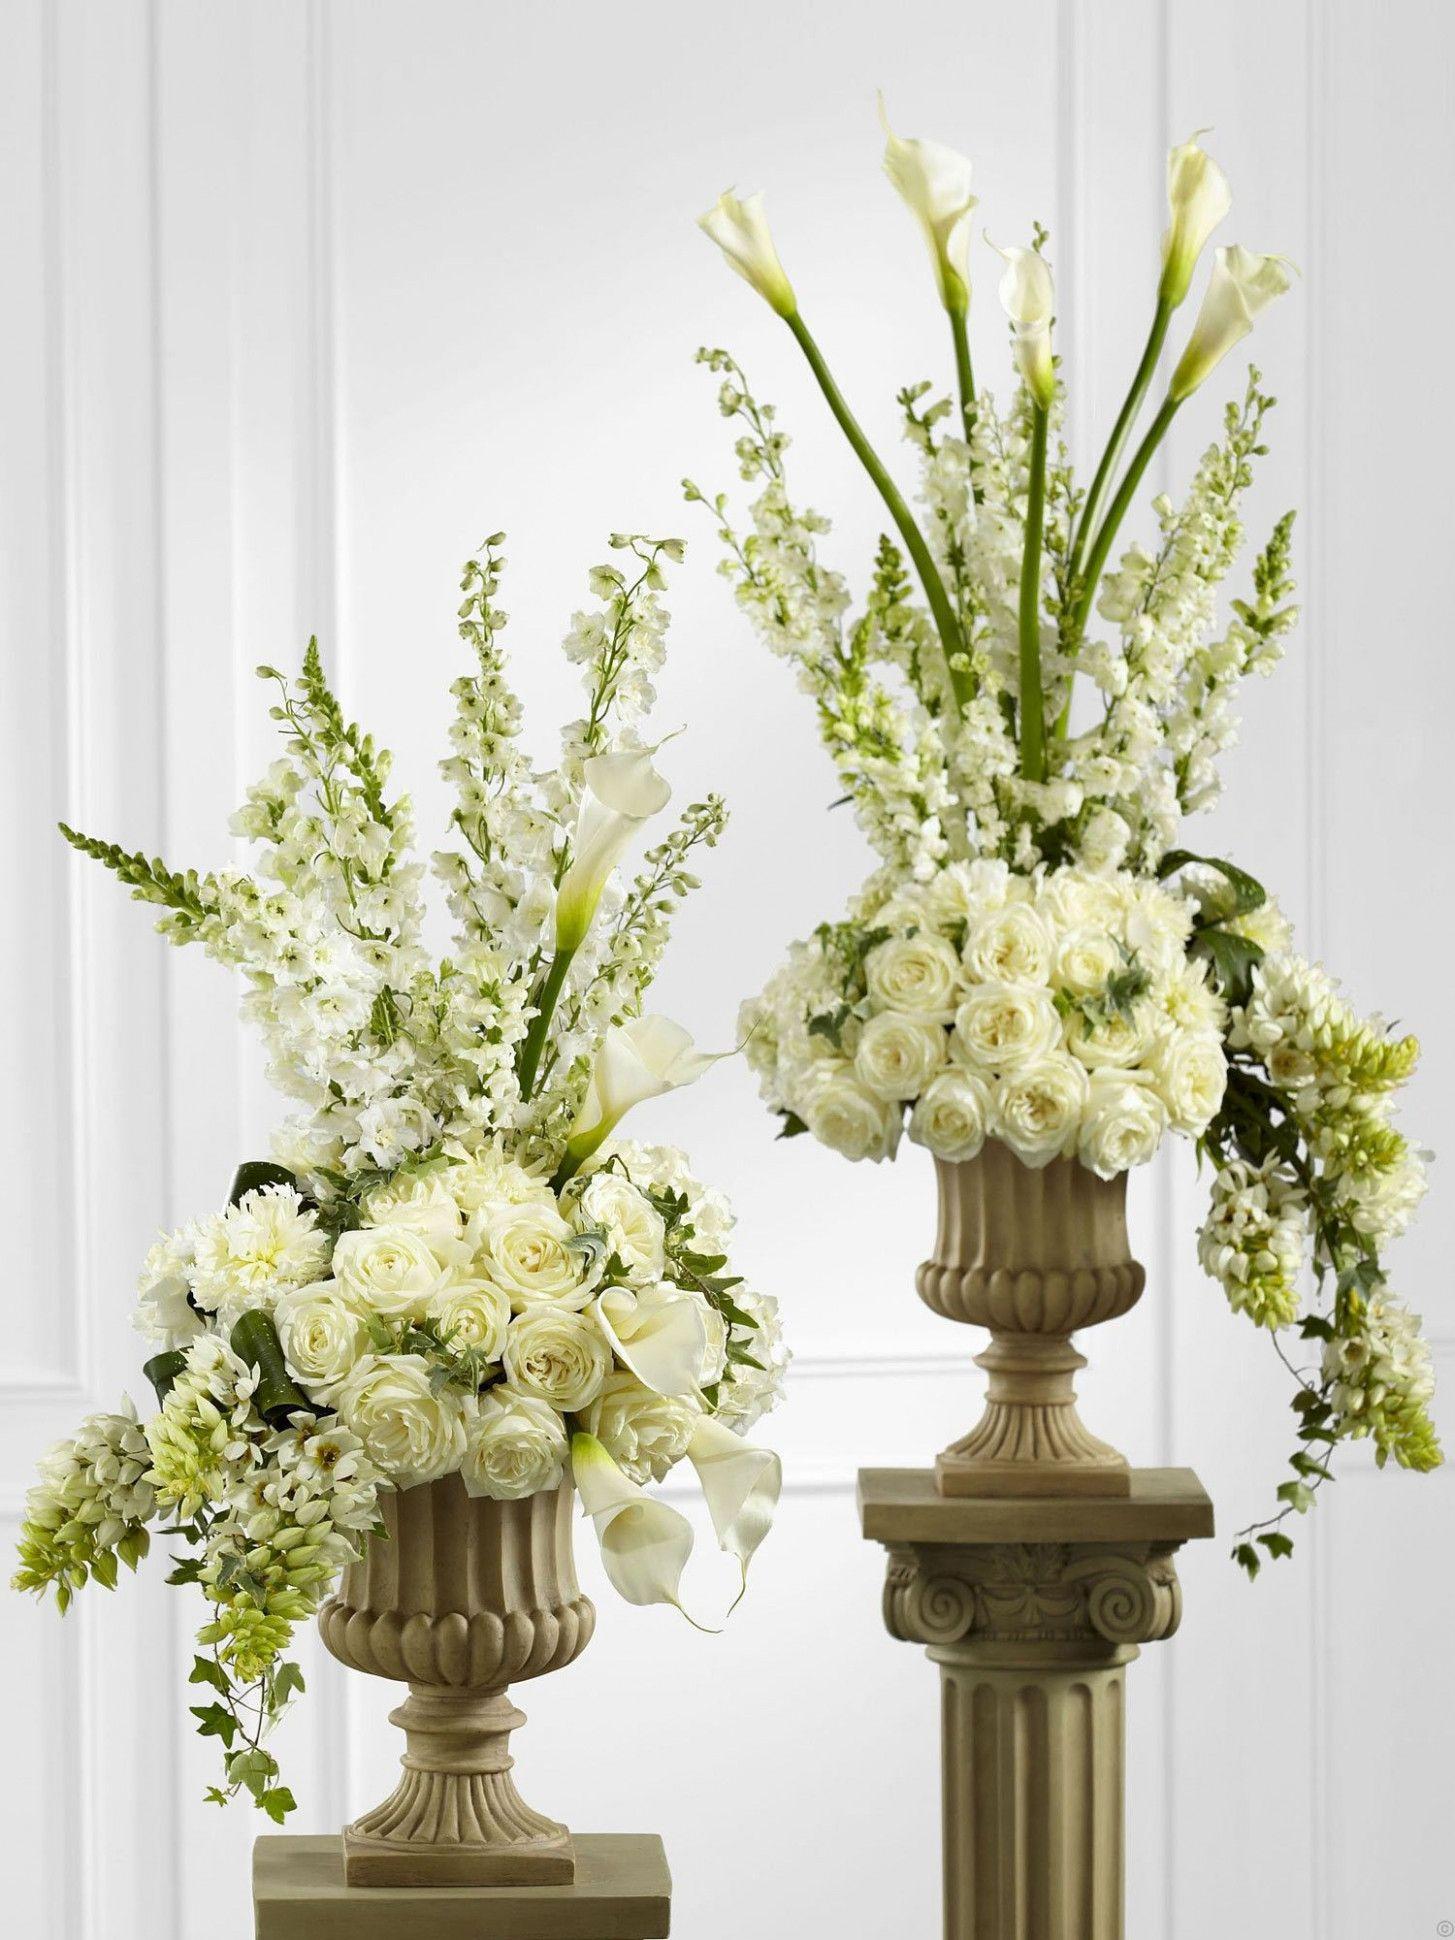 Church wedding arrangements floral design large flower